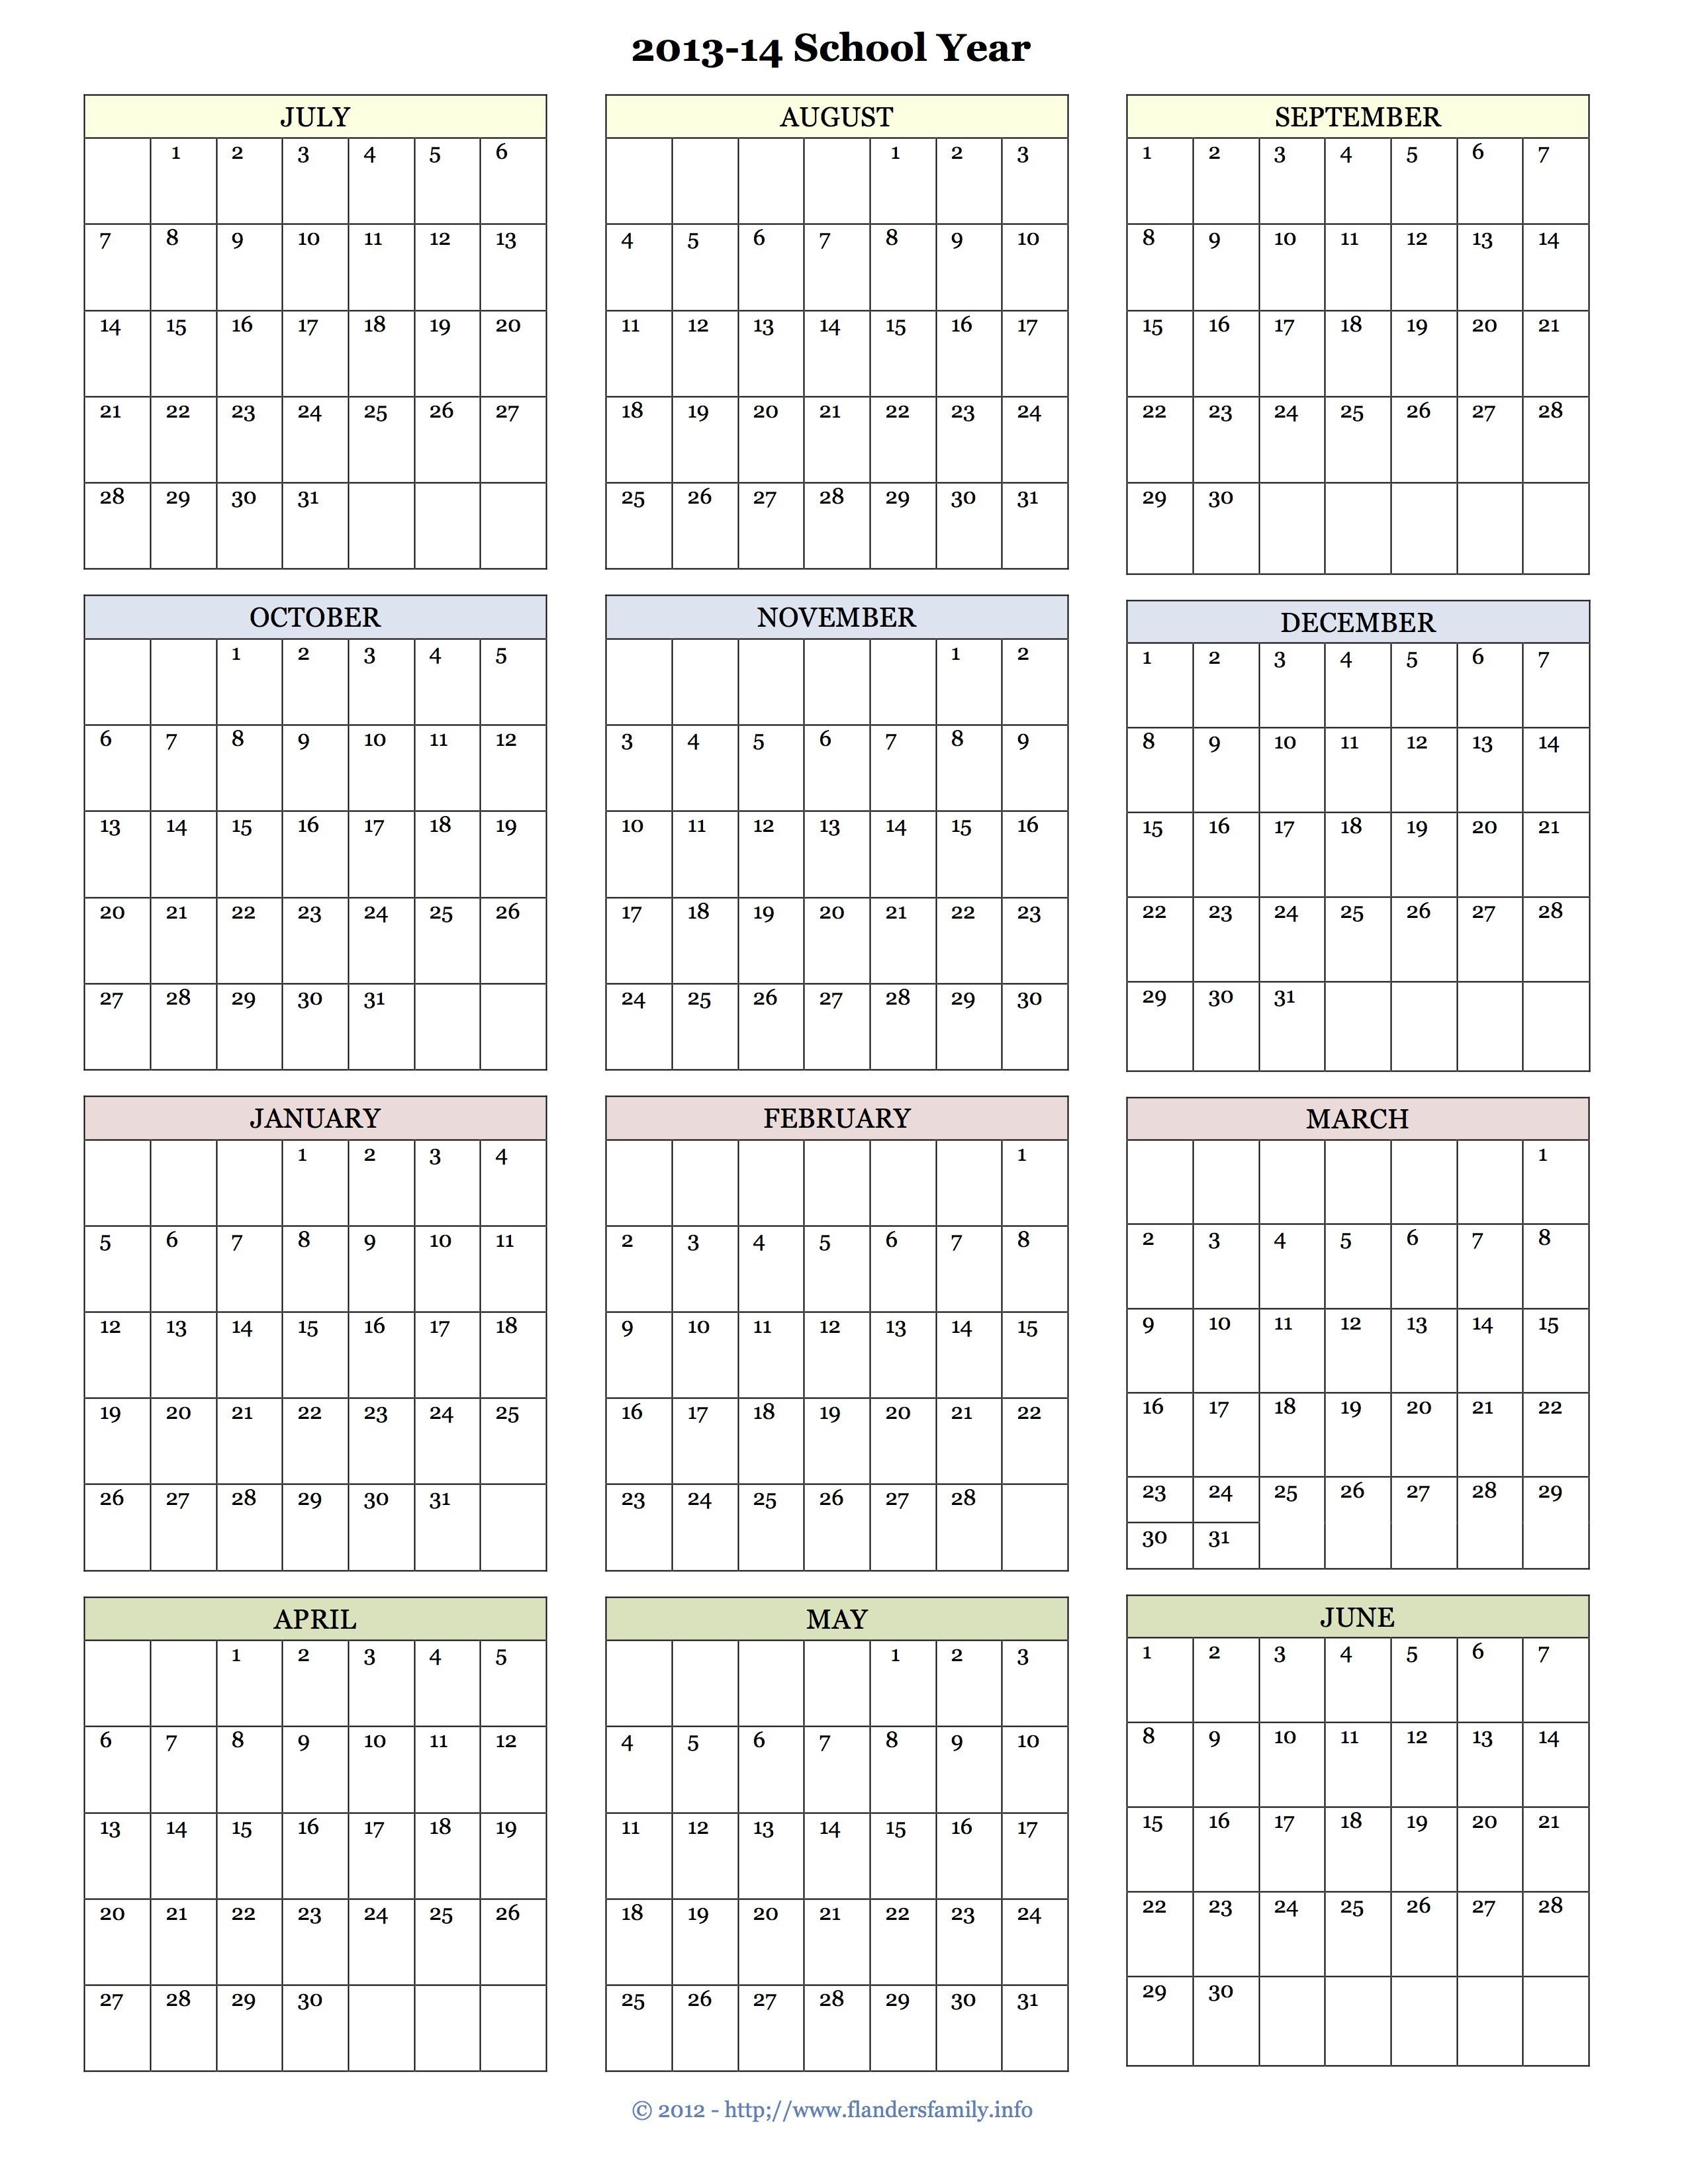 printable september 2018 calendar inj depo provera calendar depo Depo Provera Injection Calendar 2018 erdferdf